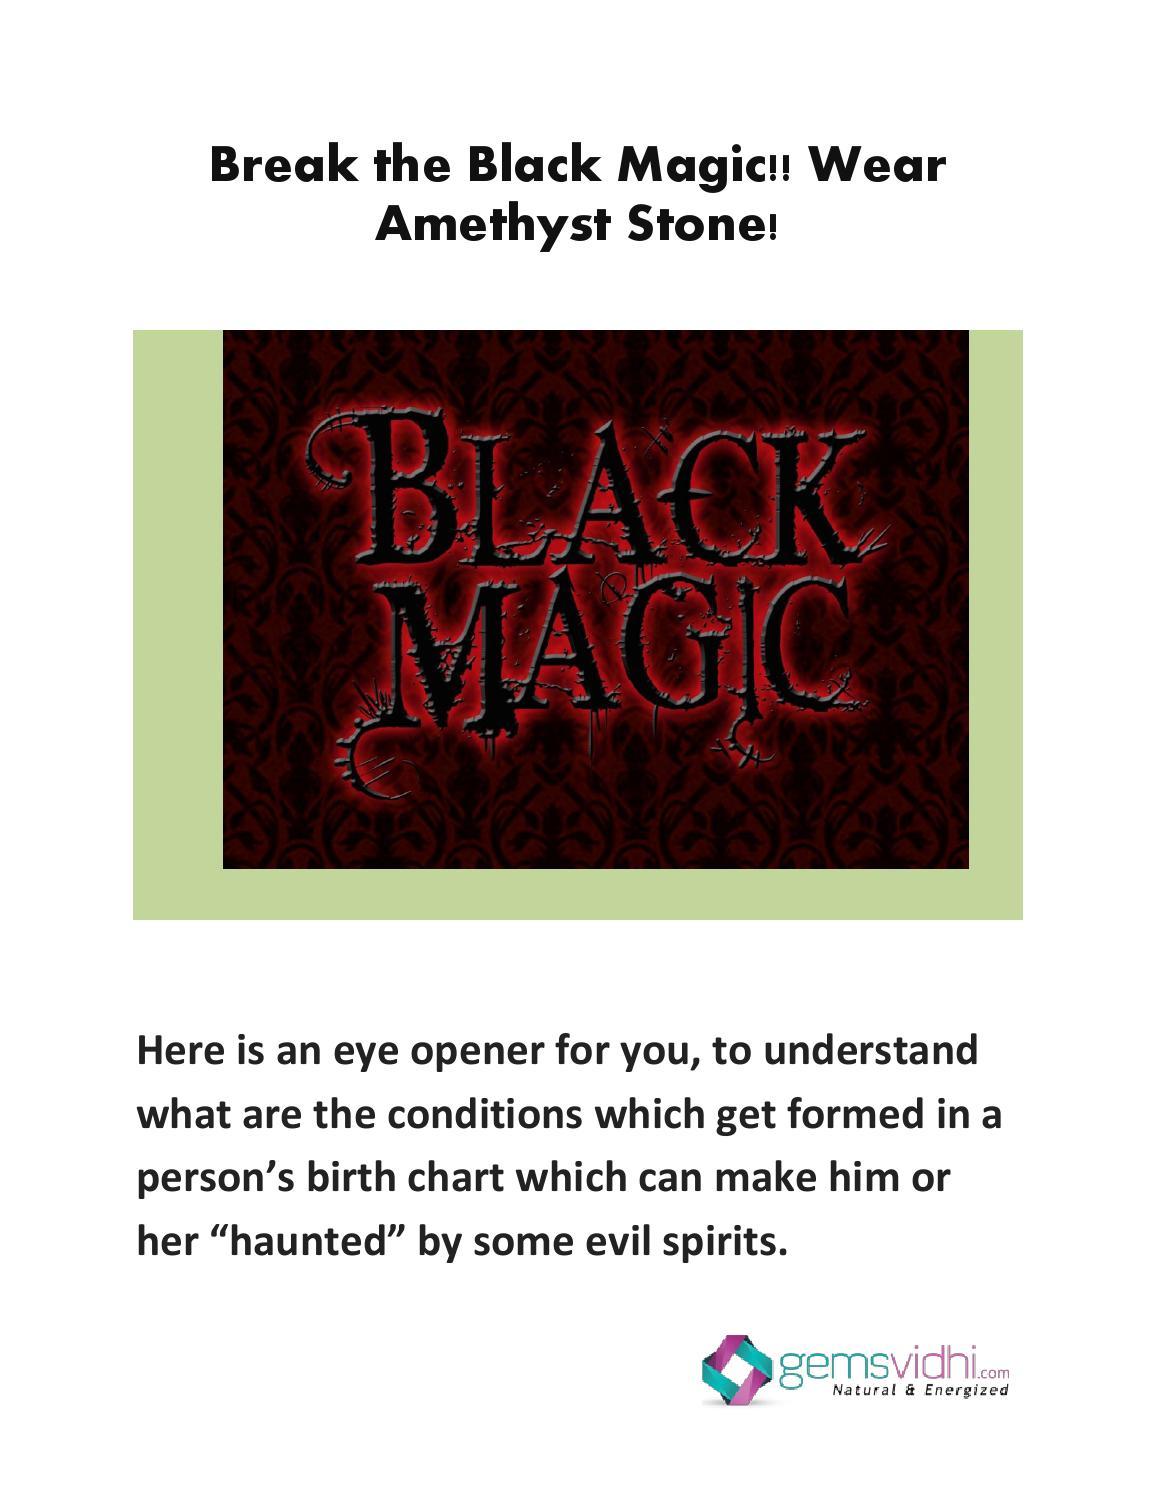 Amethyst gemstone amethyst gemstone price by gemsvidhi issuu nvjuhfo Image collections